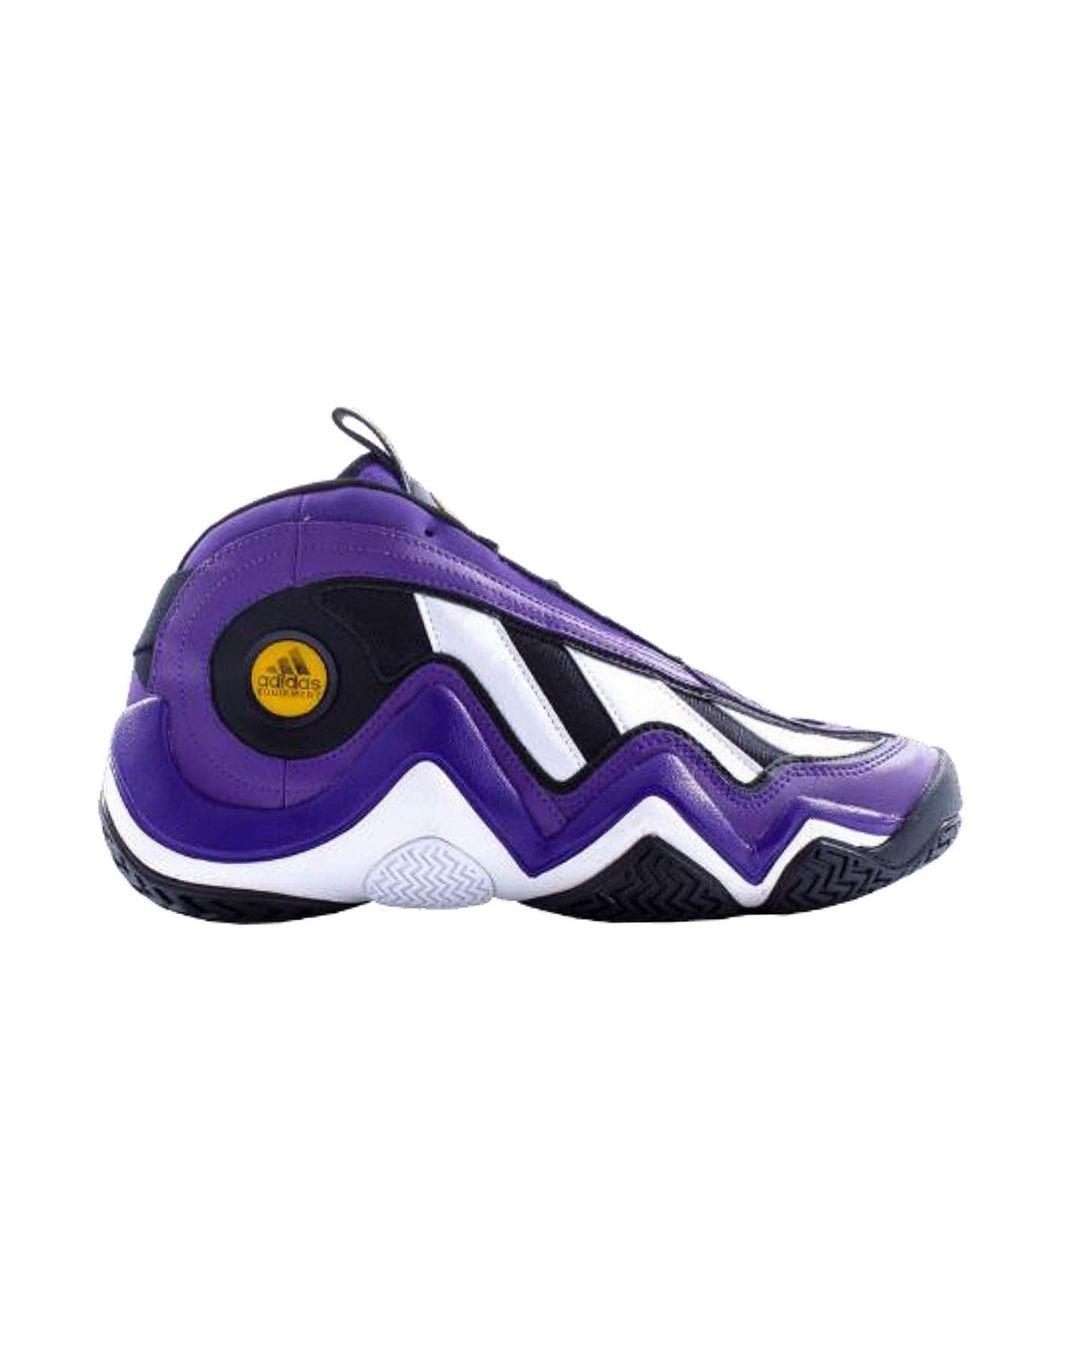 adidas,Kobe  又能买了!科比战靴将再度复刻!最快明年 2 月发售!